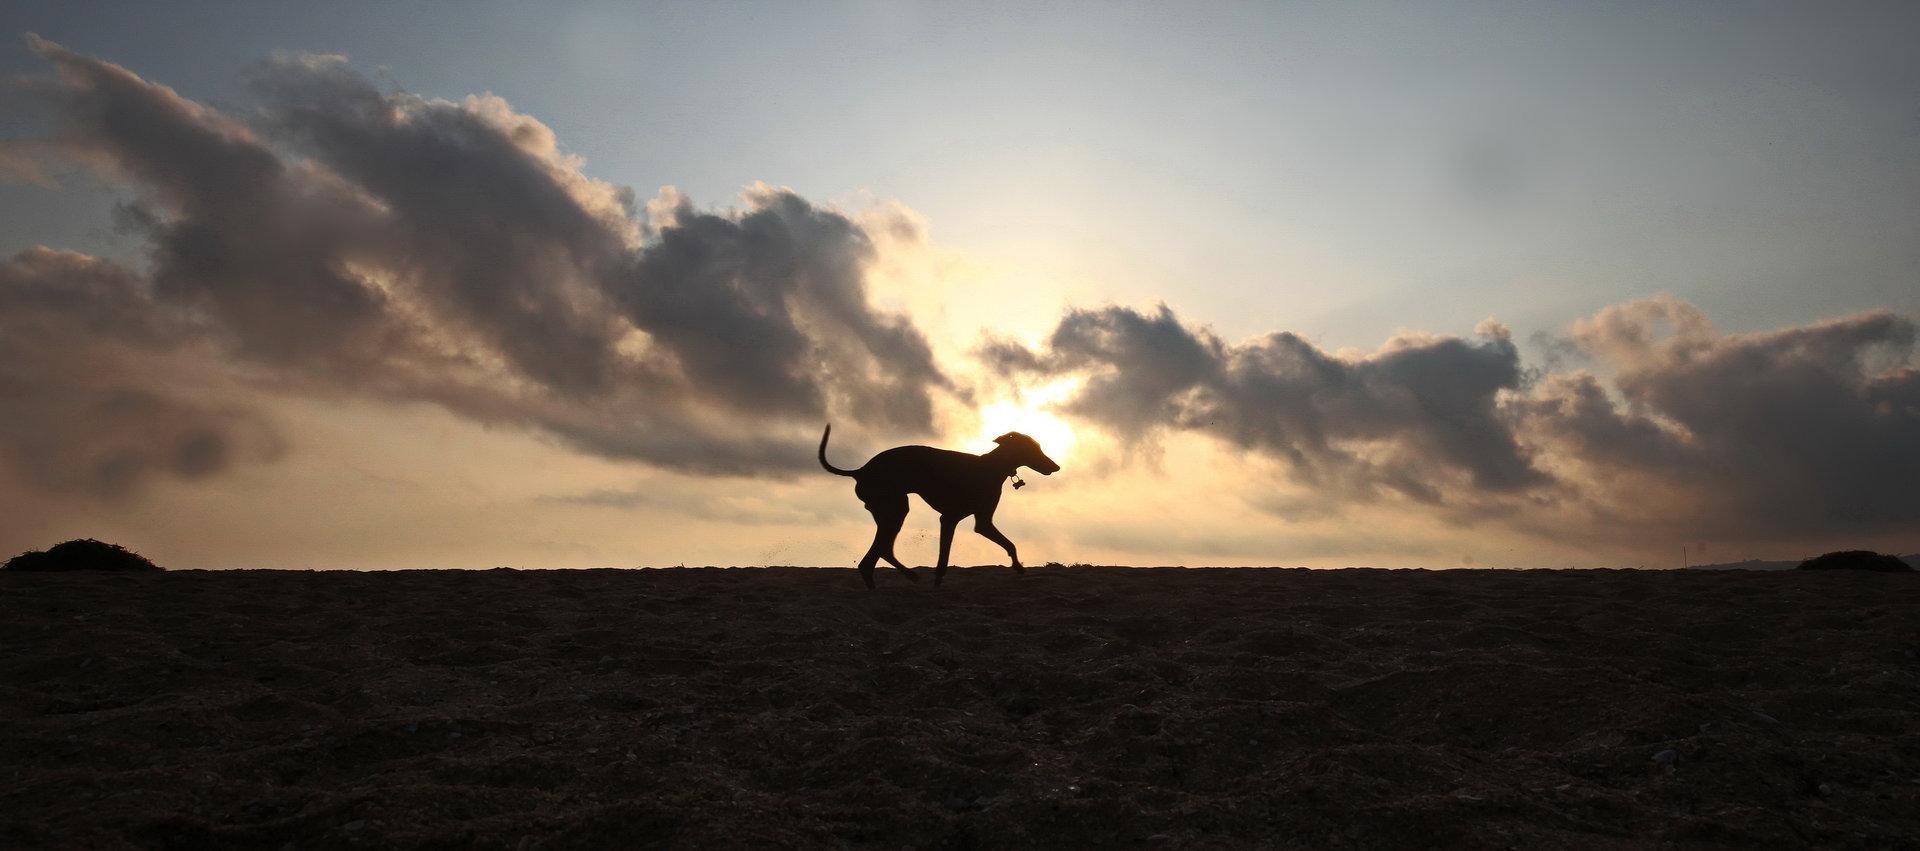 Photo in Everything else   Author rumen somov - carnivore   PHOTO FORUM